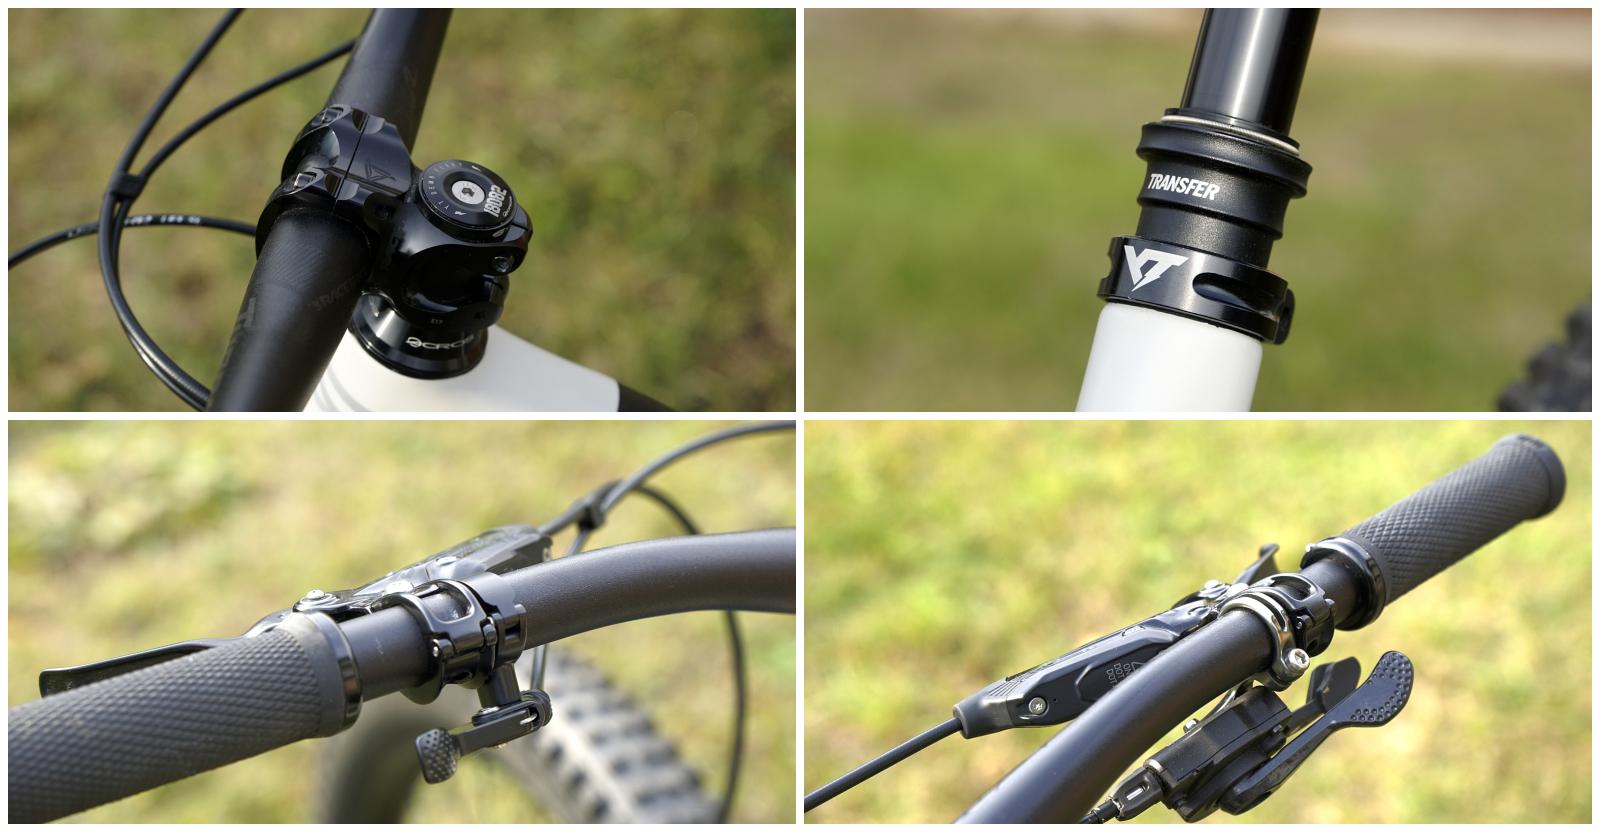 MTB-MAG COM - Mountain Bike Magazine | [Tested] YT Capra 29